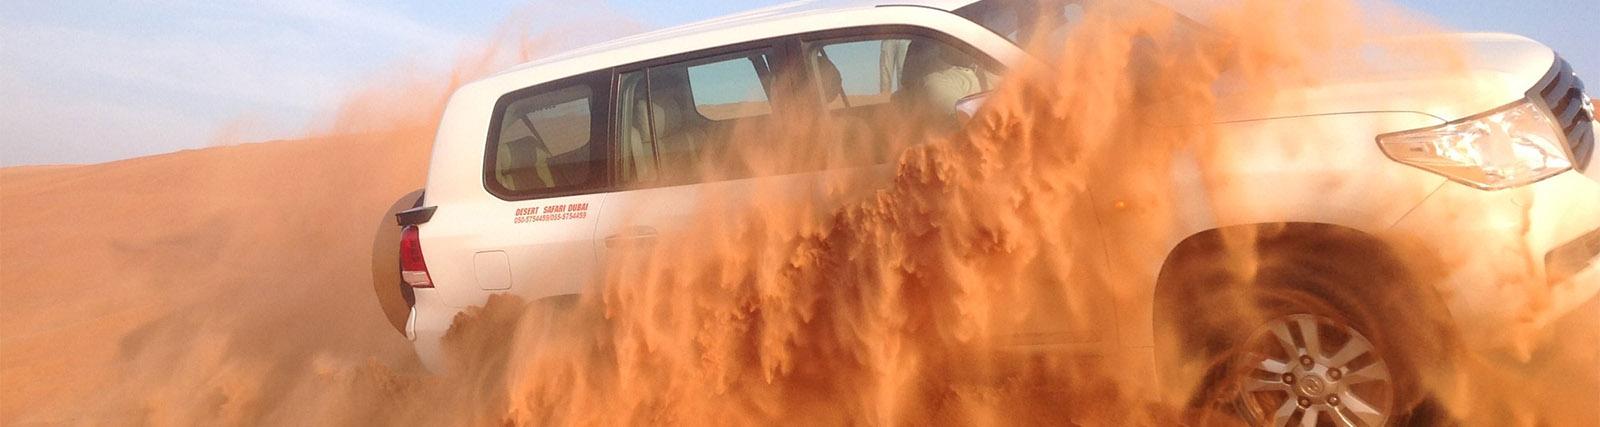 Desert-safari-dune-bashing-front